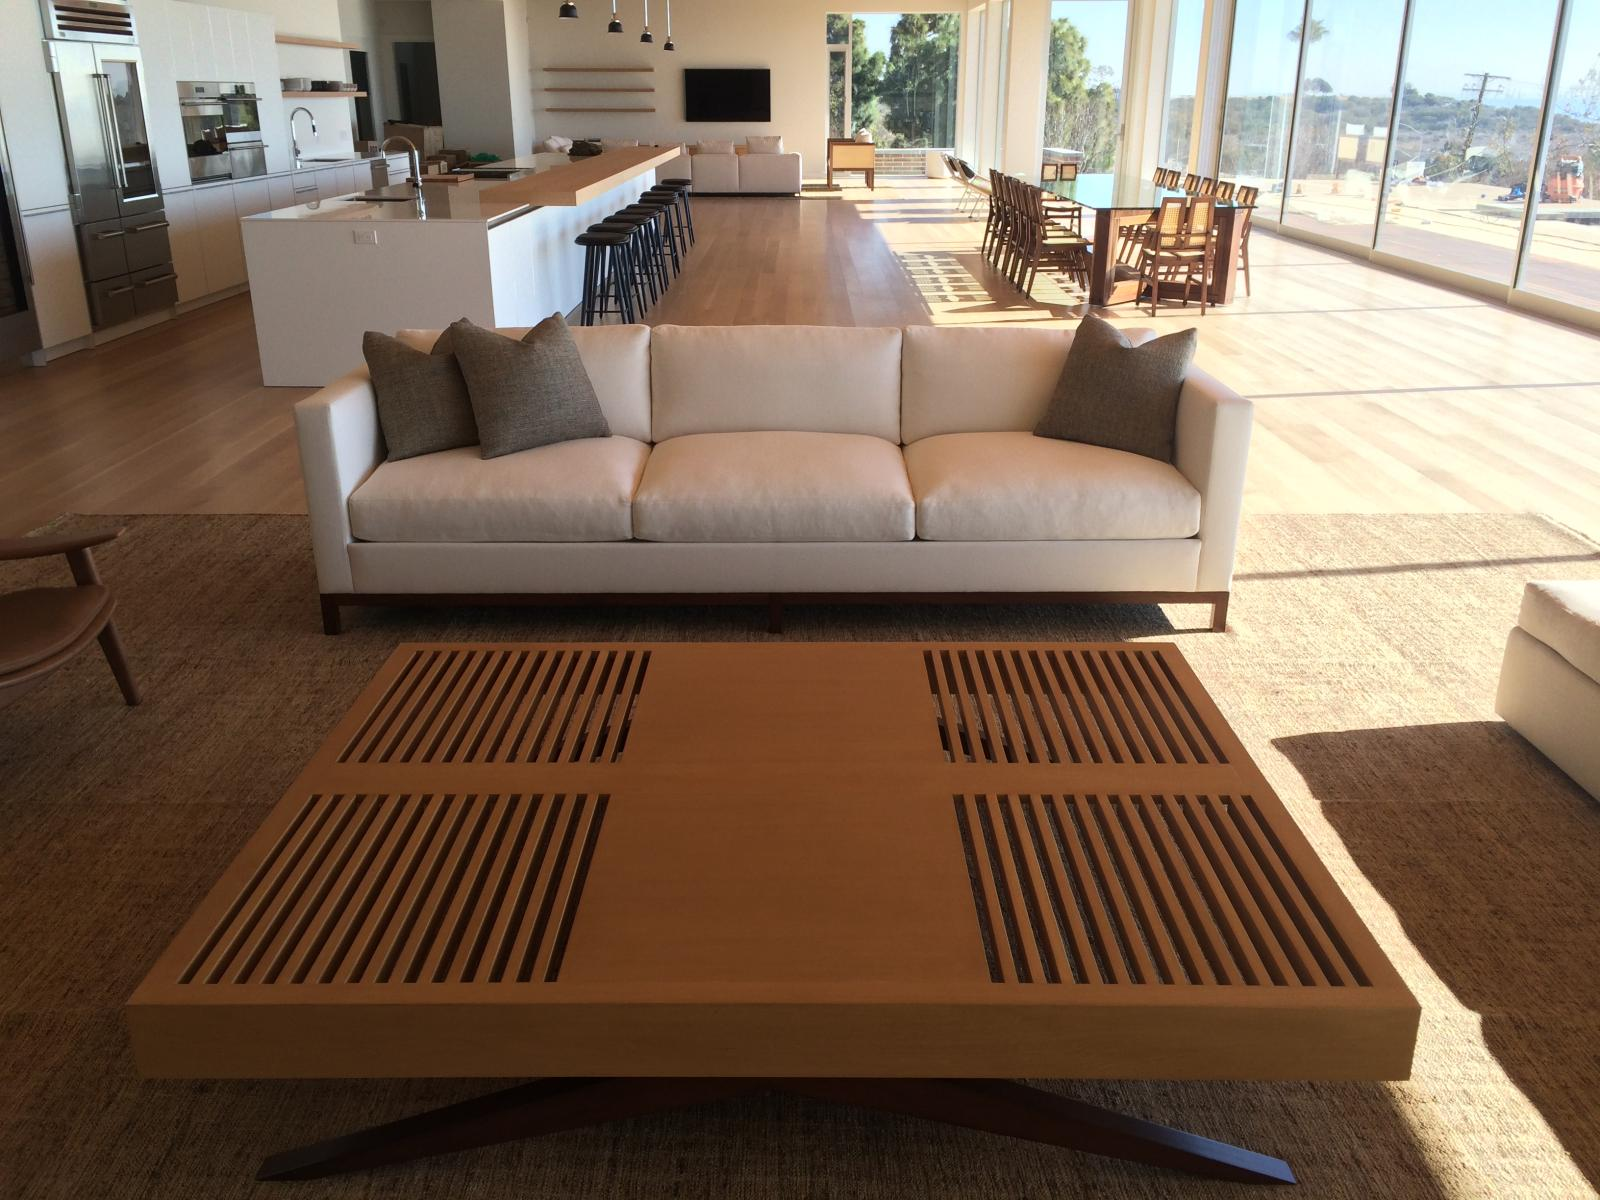 Furniture Et Al: Custom Cabinetry U0026 Design Southern California Closets  Kitchens Entertainment Centers Artful Craftsmen